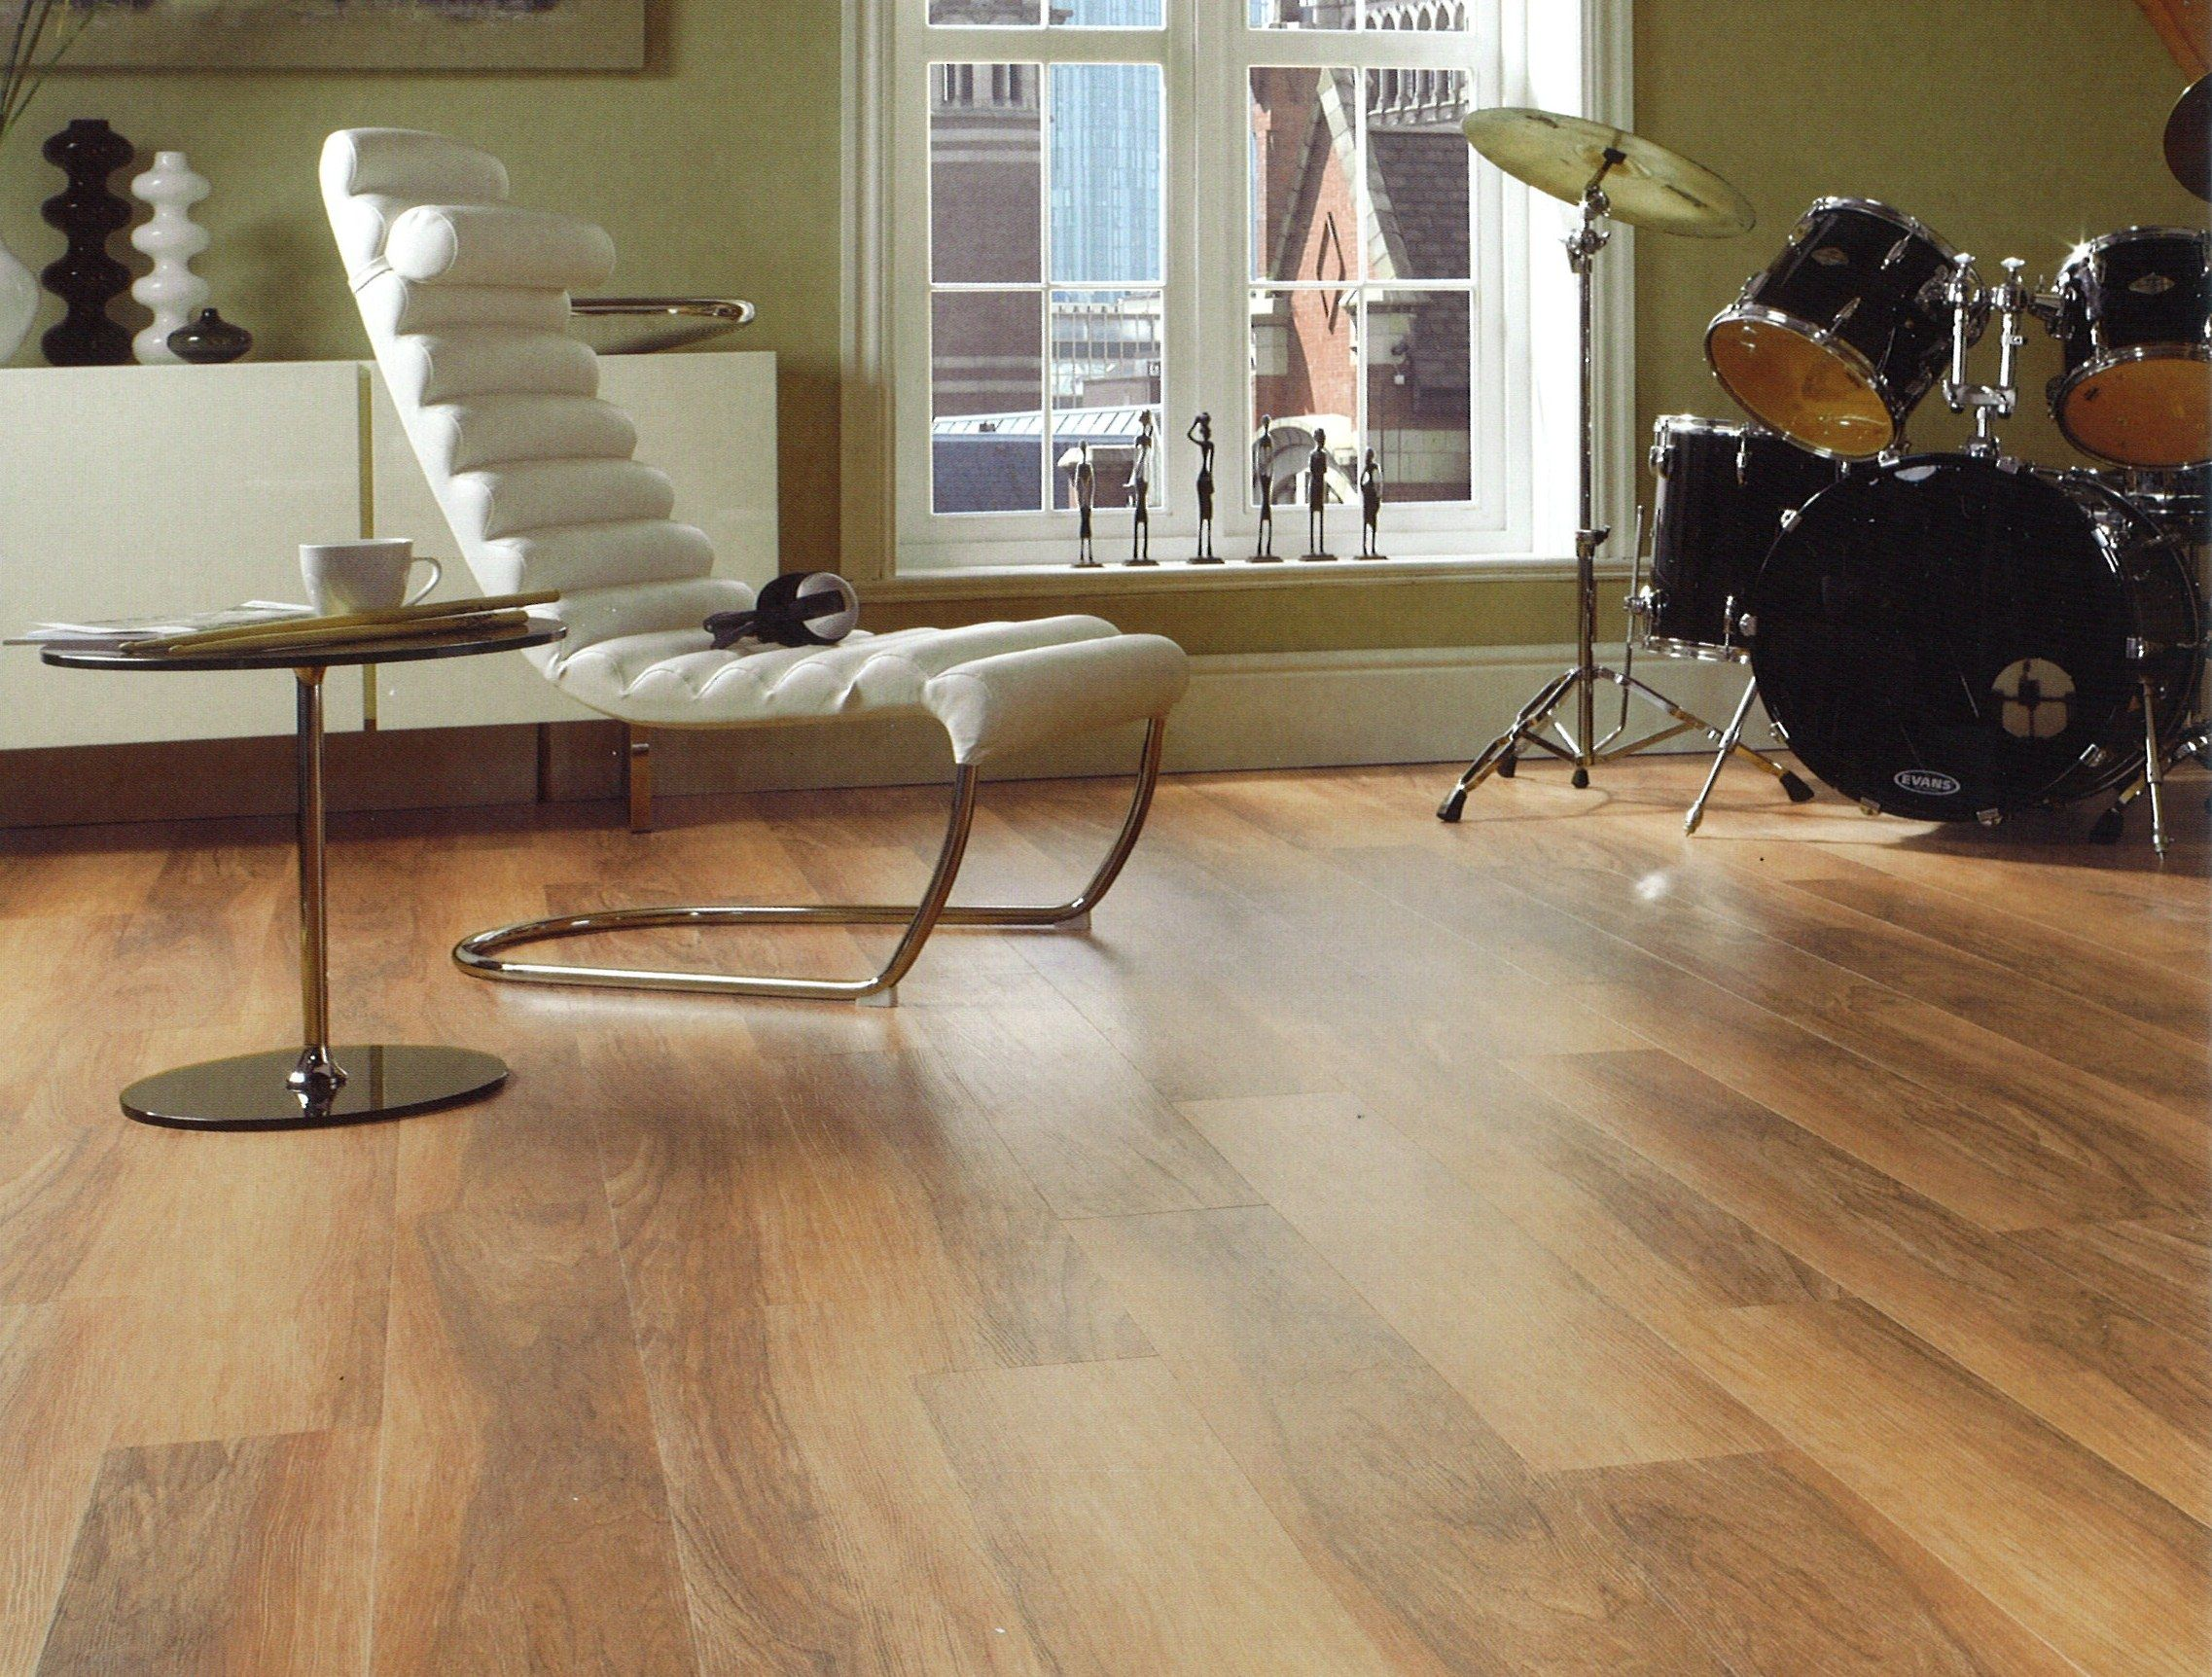 vinyl planking floor pictures vinylplankflooring